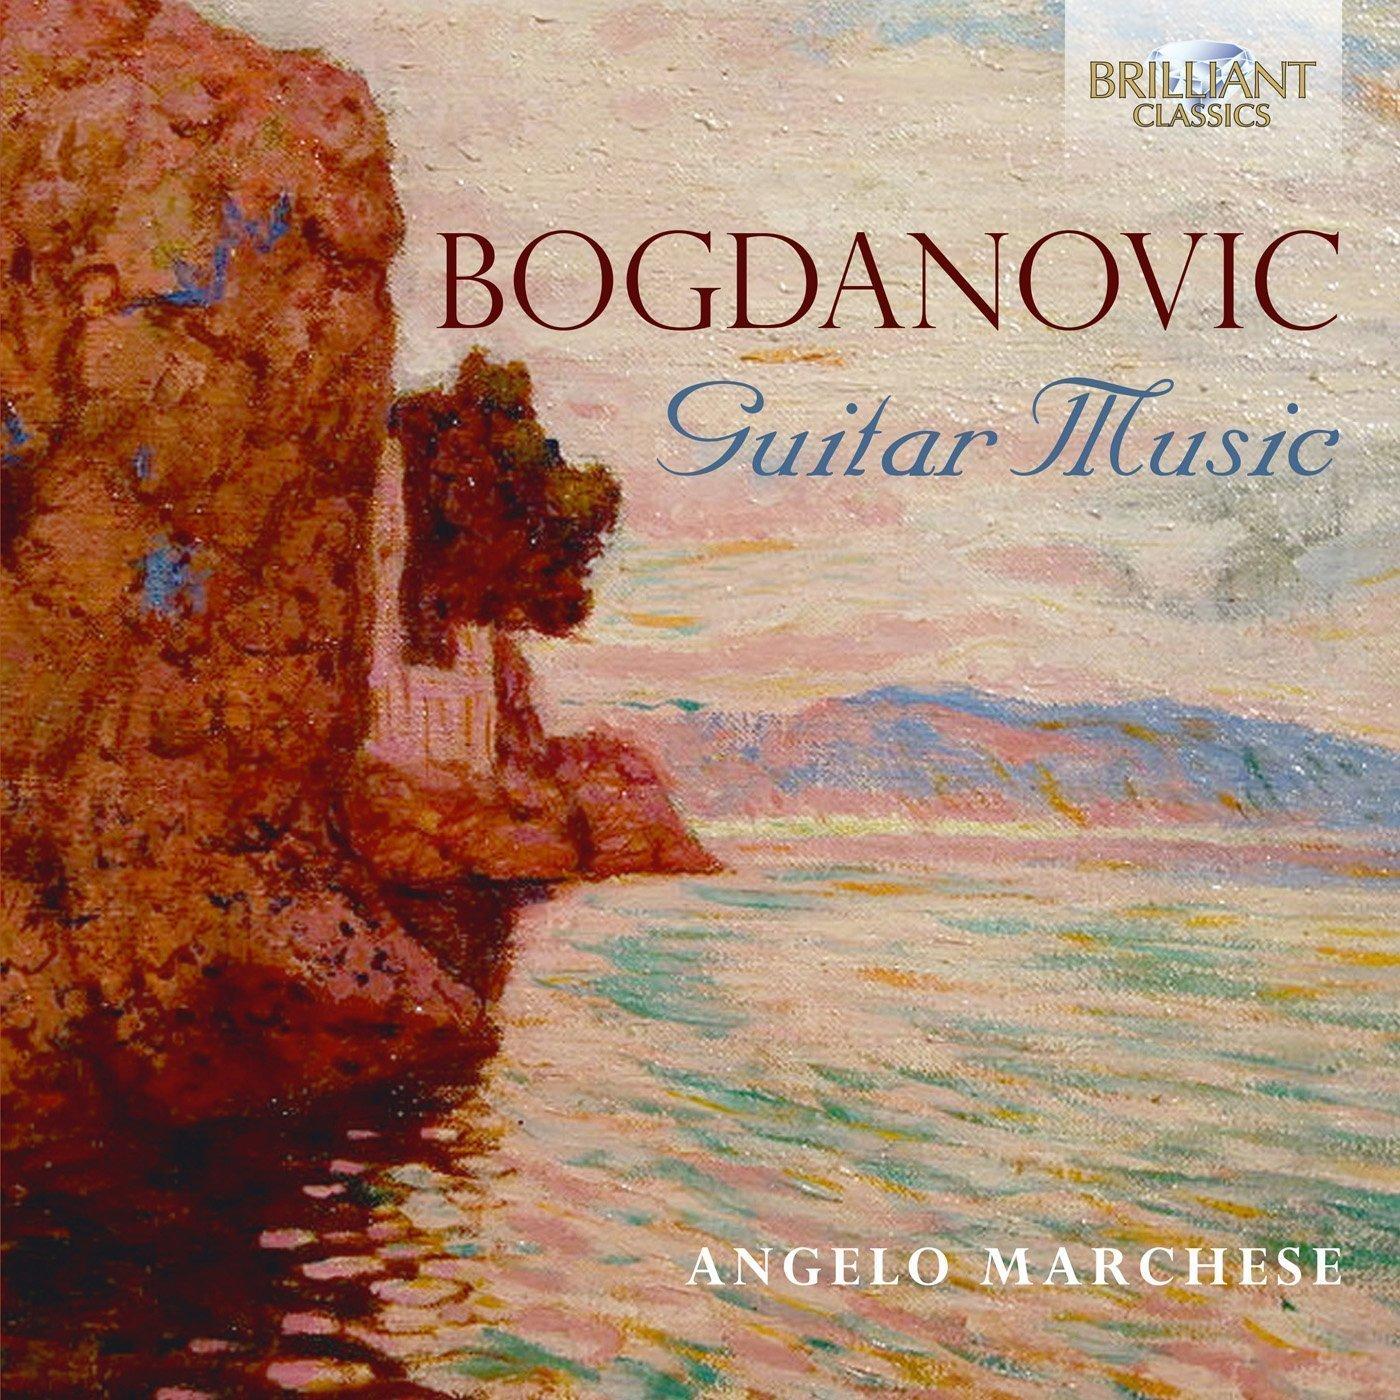 Bogdanović: Guitar Music